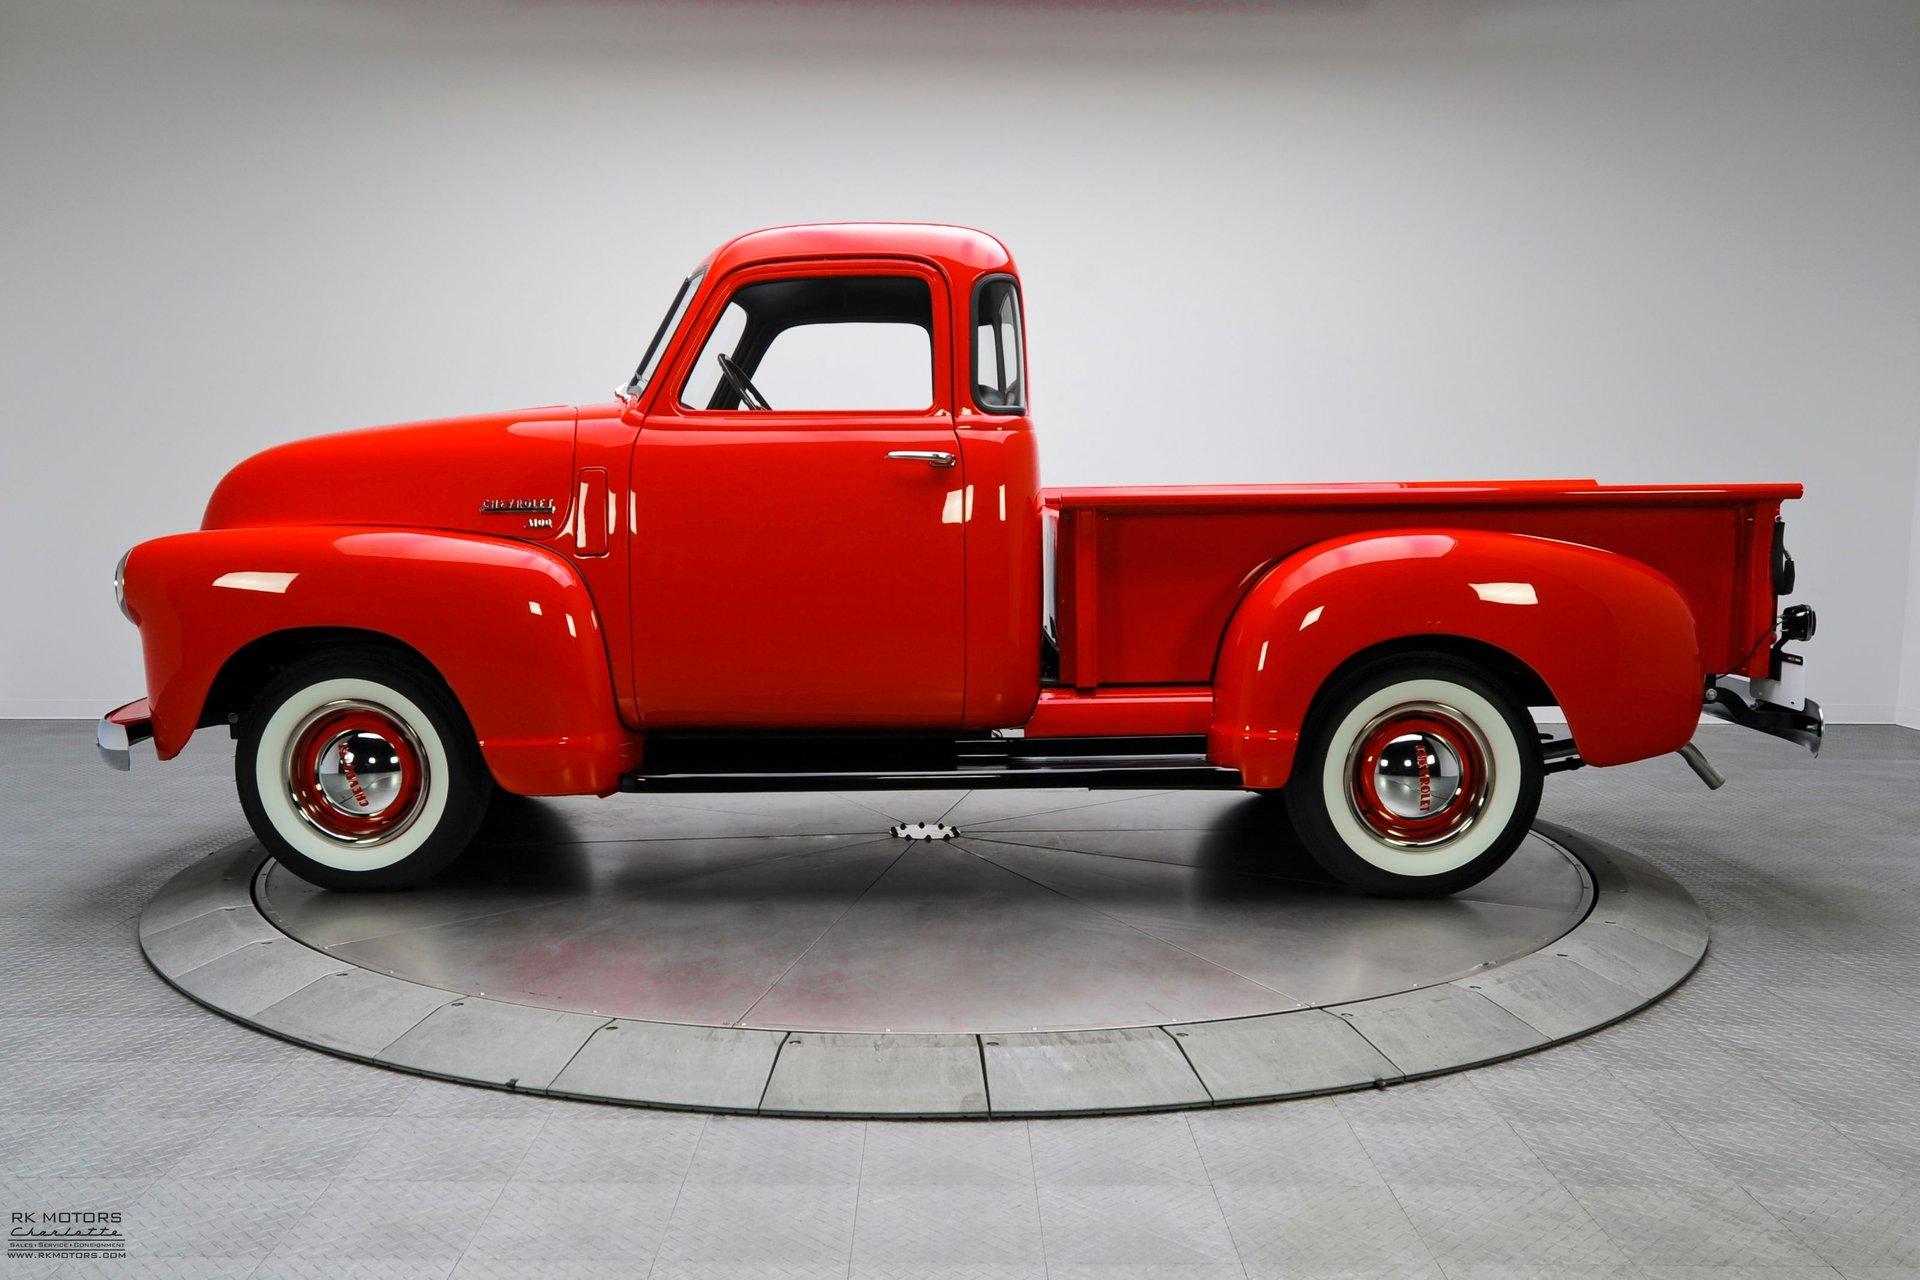 133361 1949 Chevrolet 3100 RK Motors Classic Cars for Sale